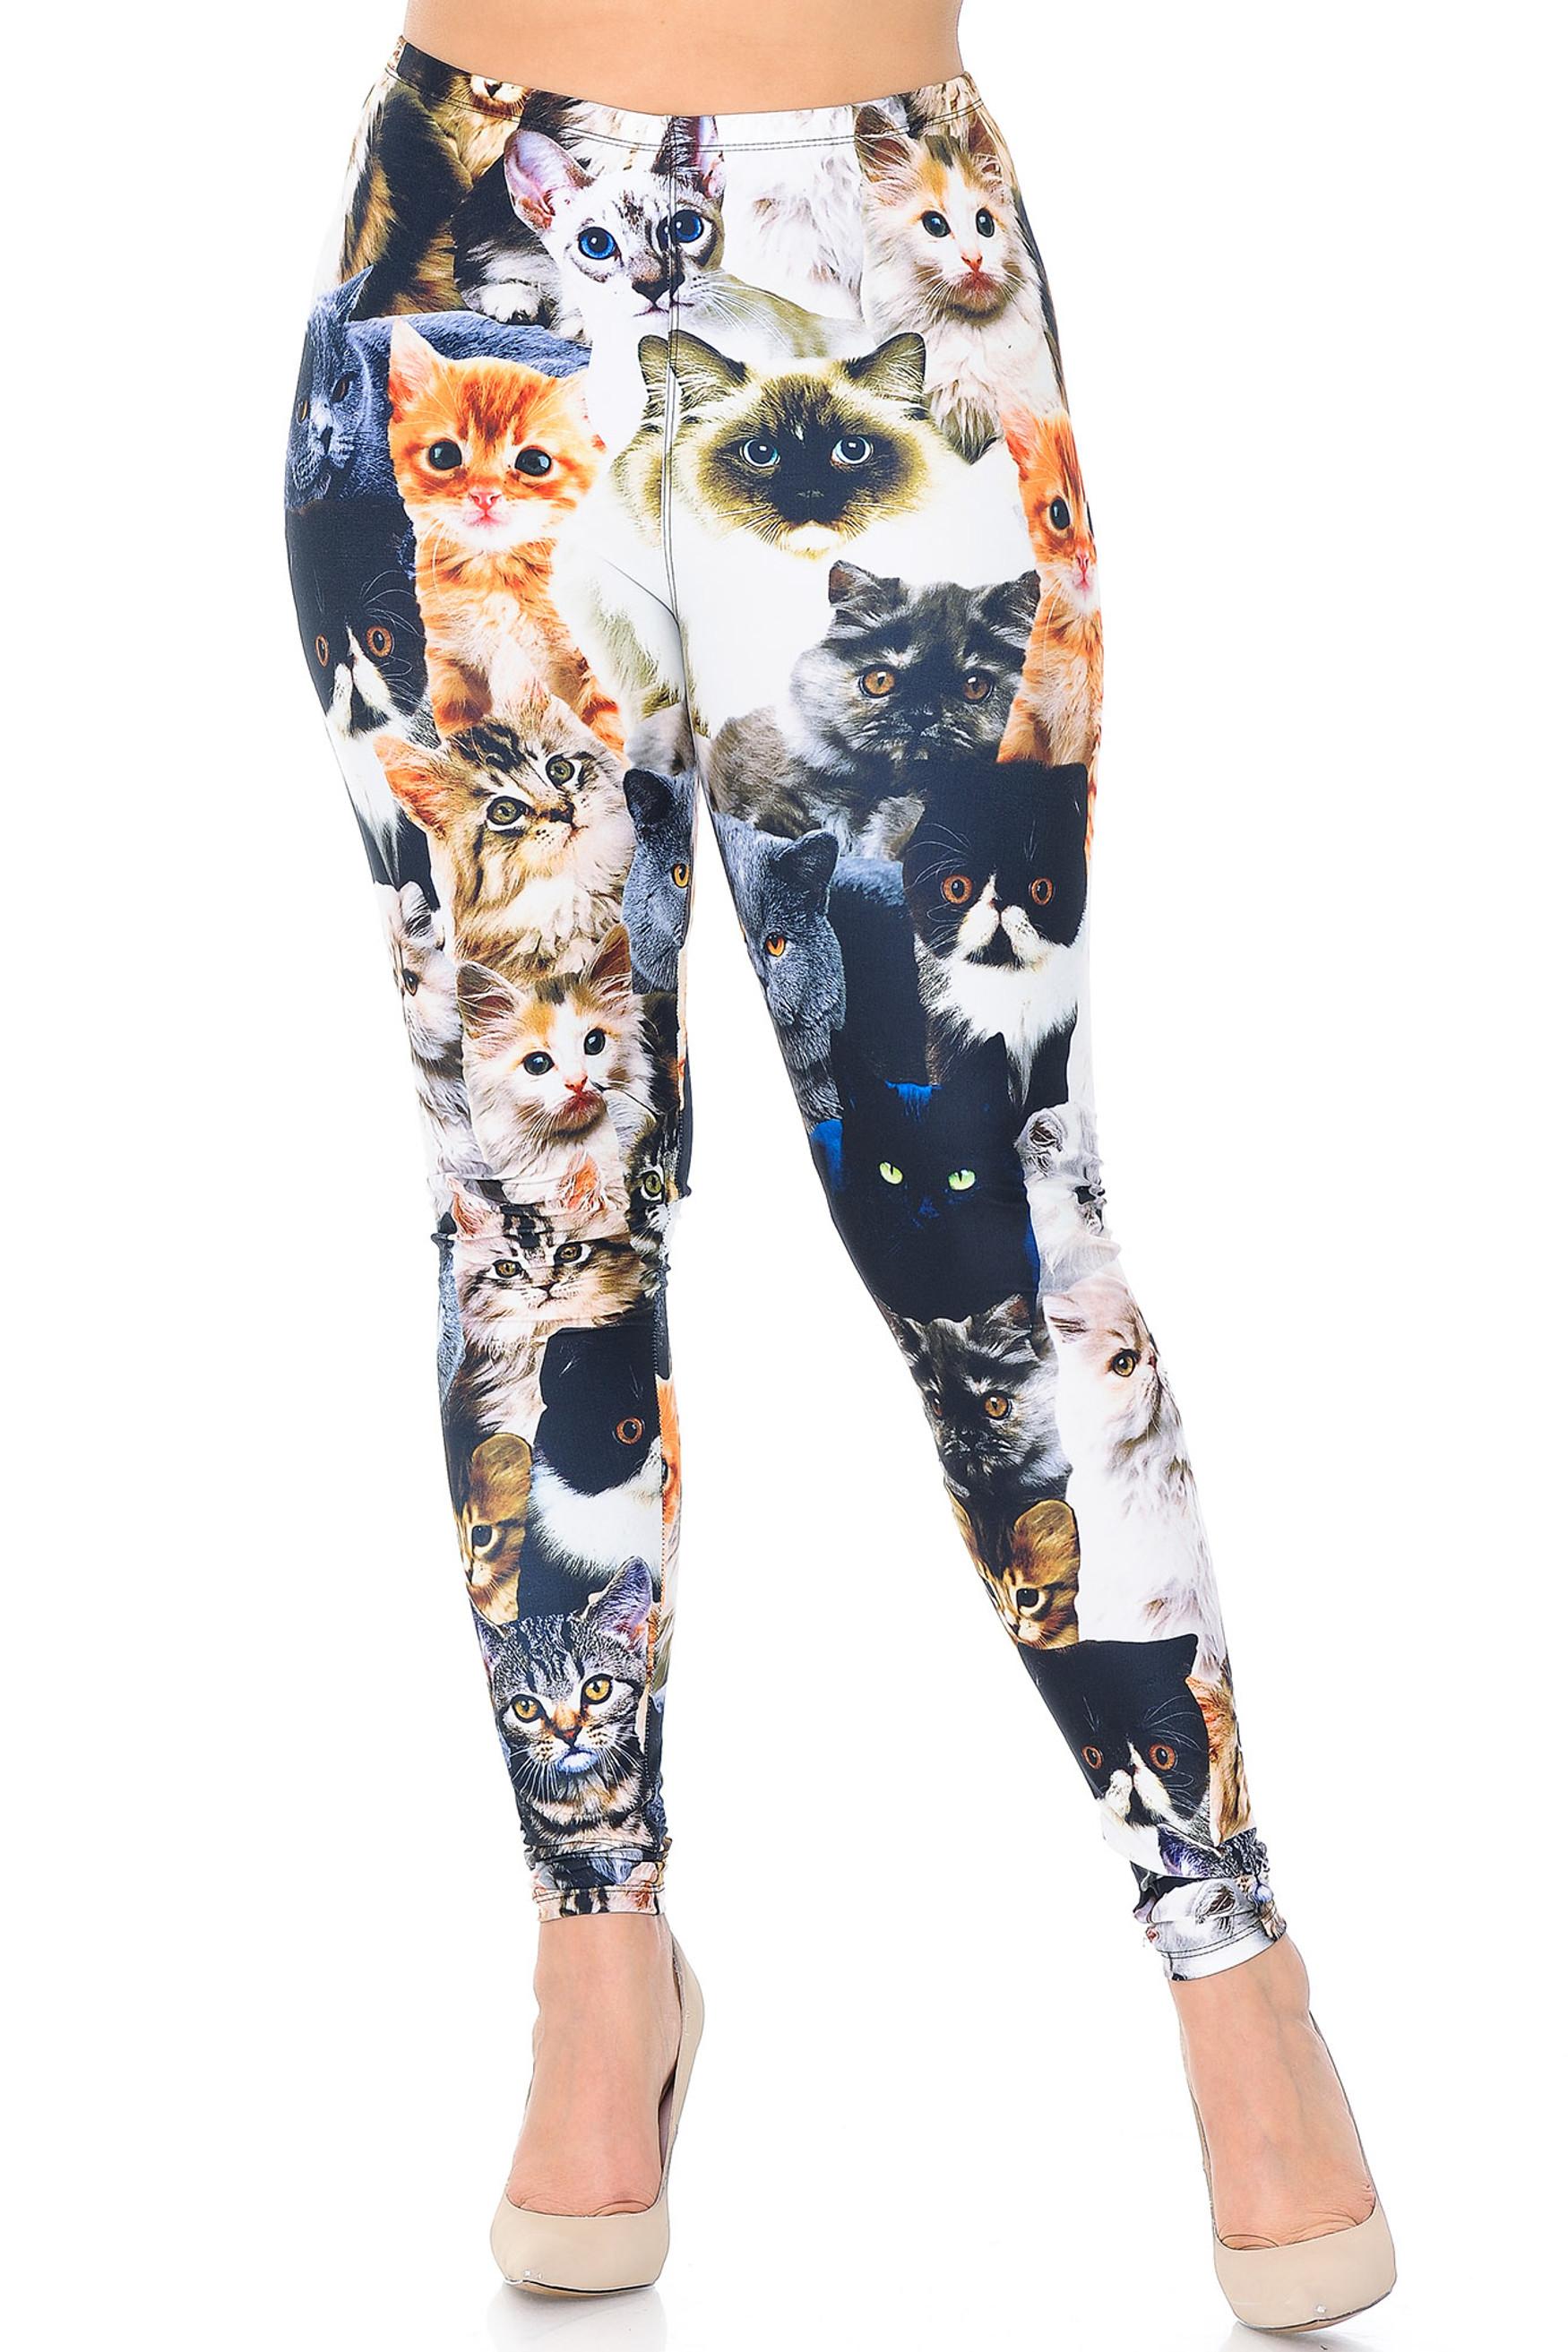 Creamy Soft Cat Collage Extra Plus Size Leggings - 3X-5X - USA Fashion™